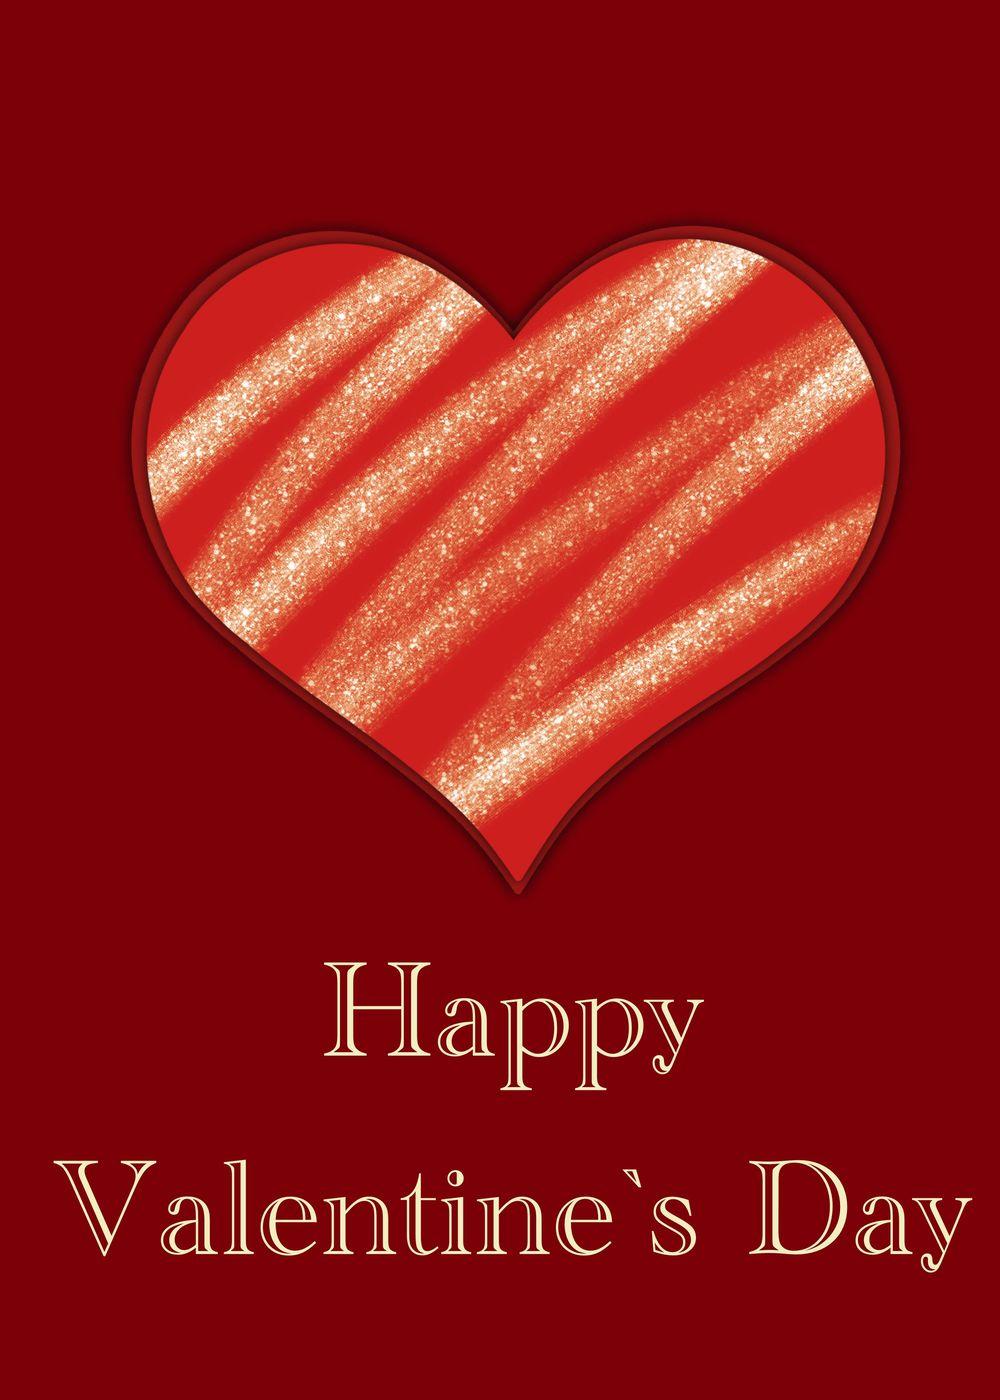 Valentine mood - image 1 - student project